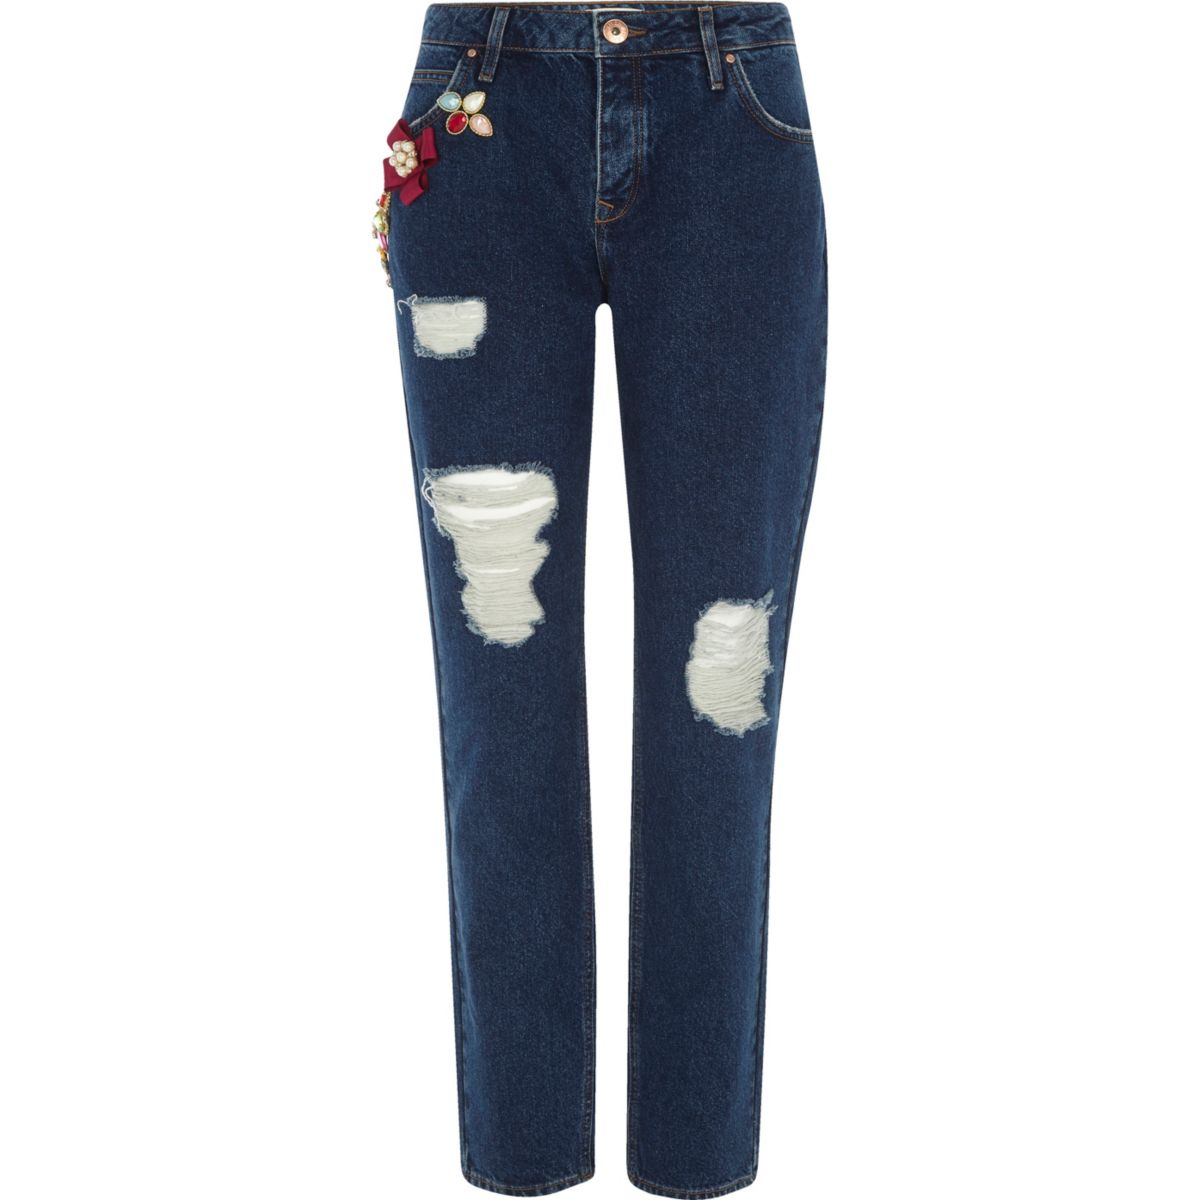 boyfriend jeans im used look jeans sale damen. Black Bedroom Furniture Sets. Home Design Ideas